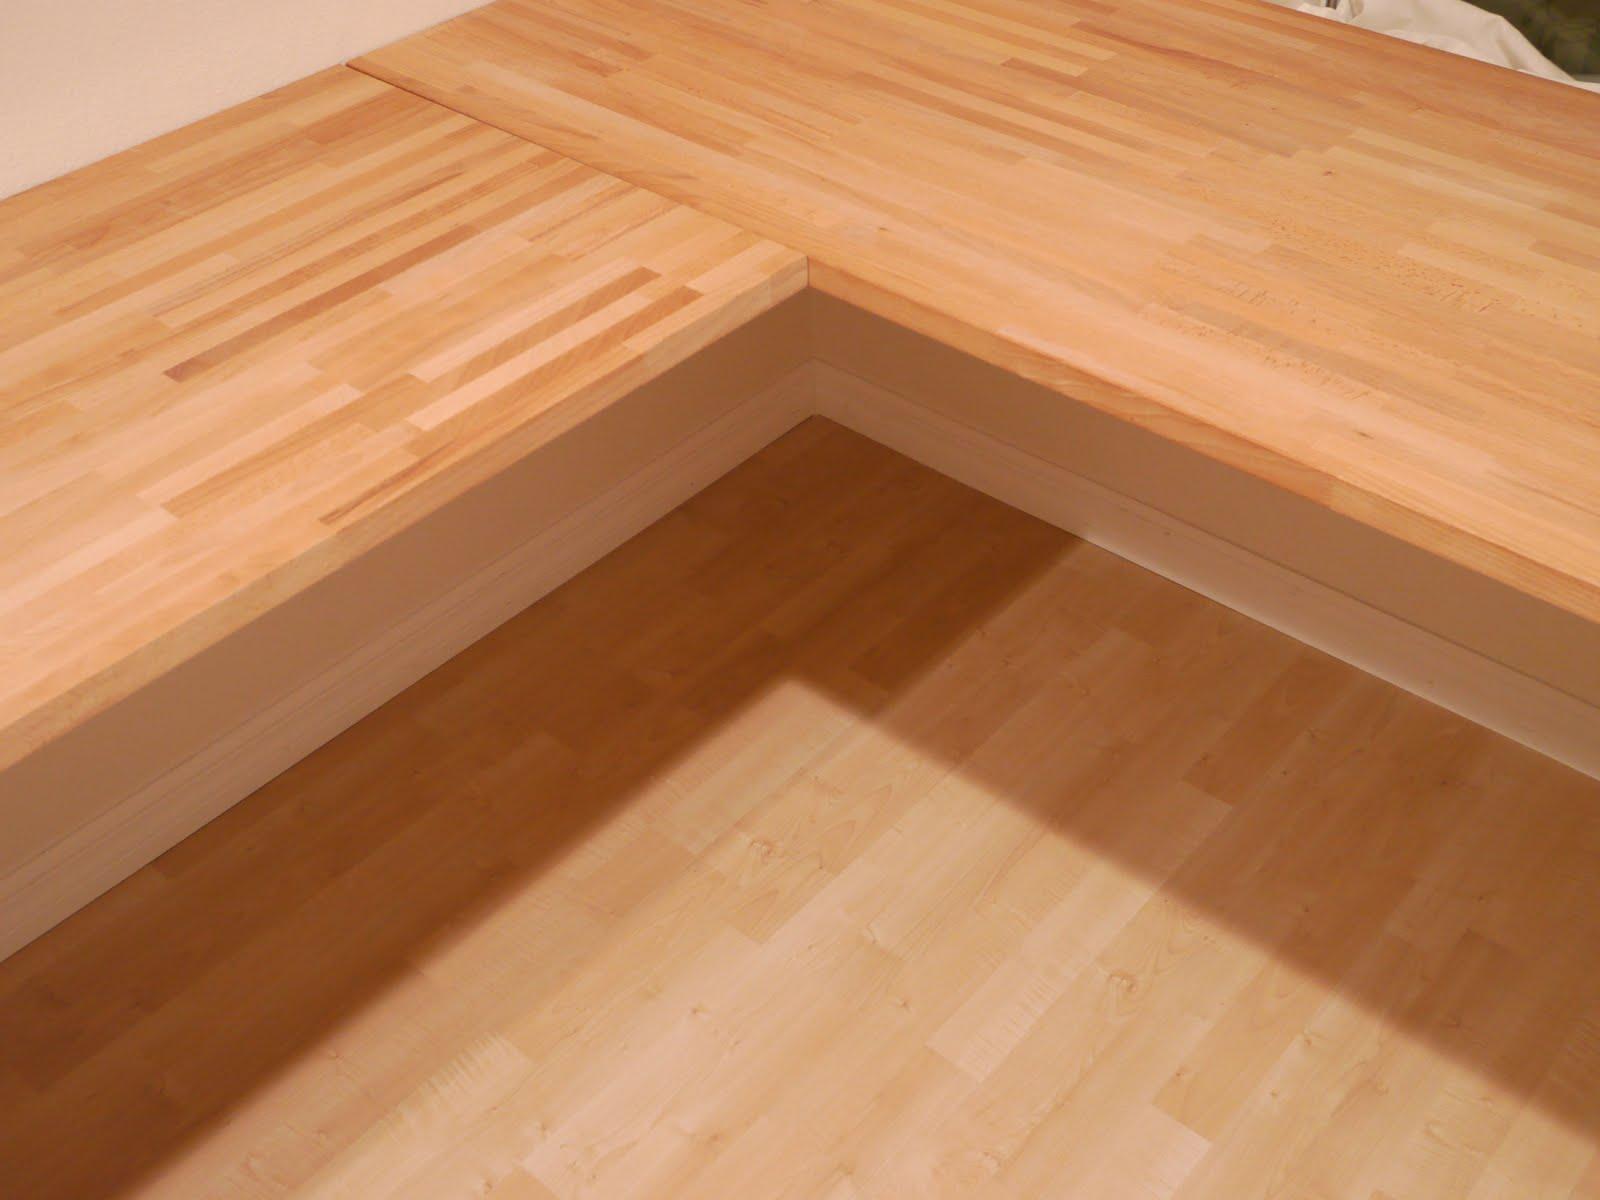 Ikea Countertop Materials : Kids study room - IKEA Hackers - IKEA Hackers